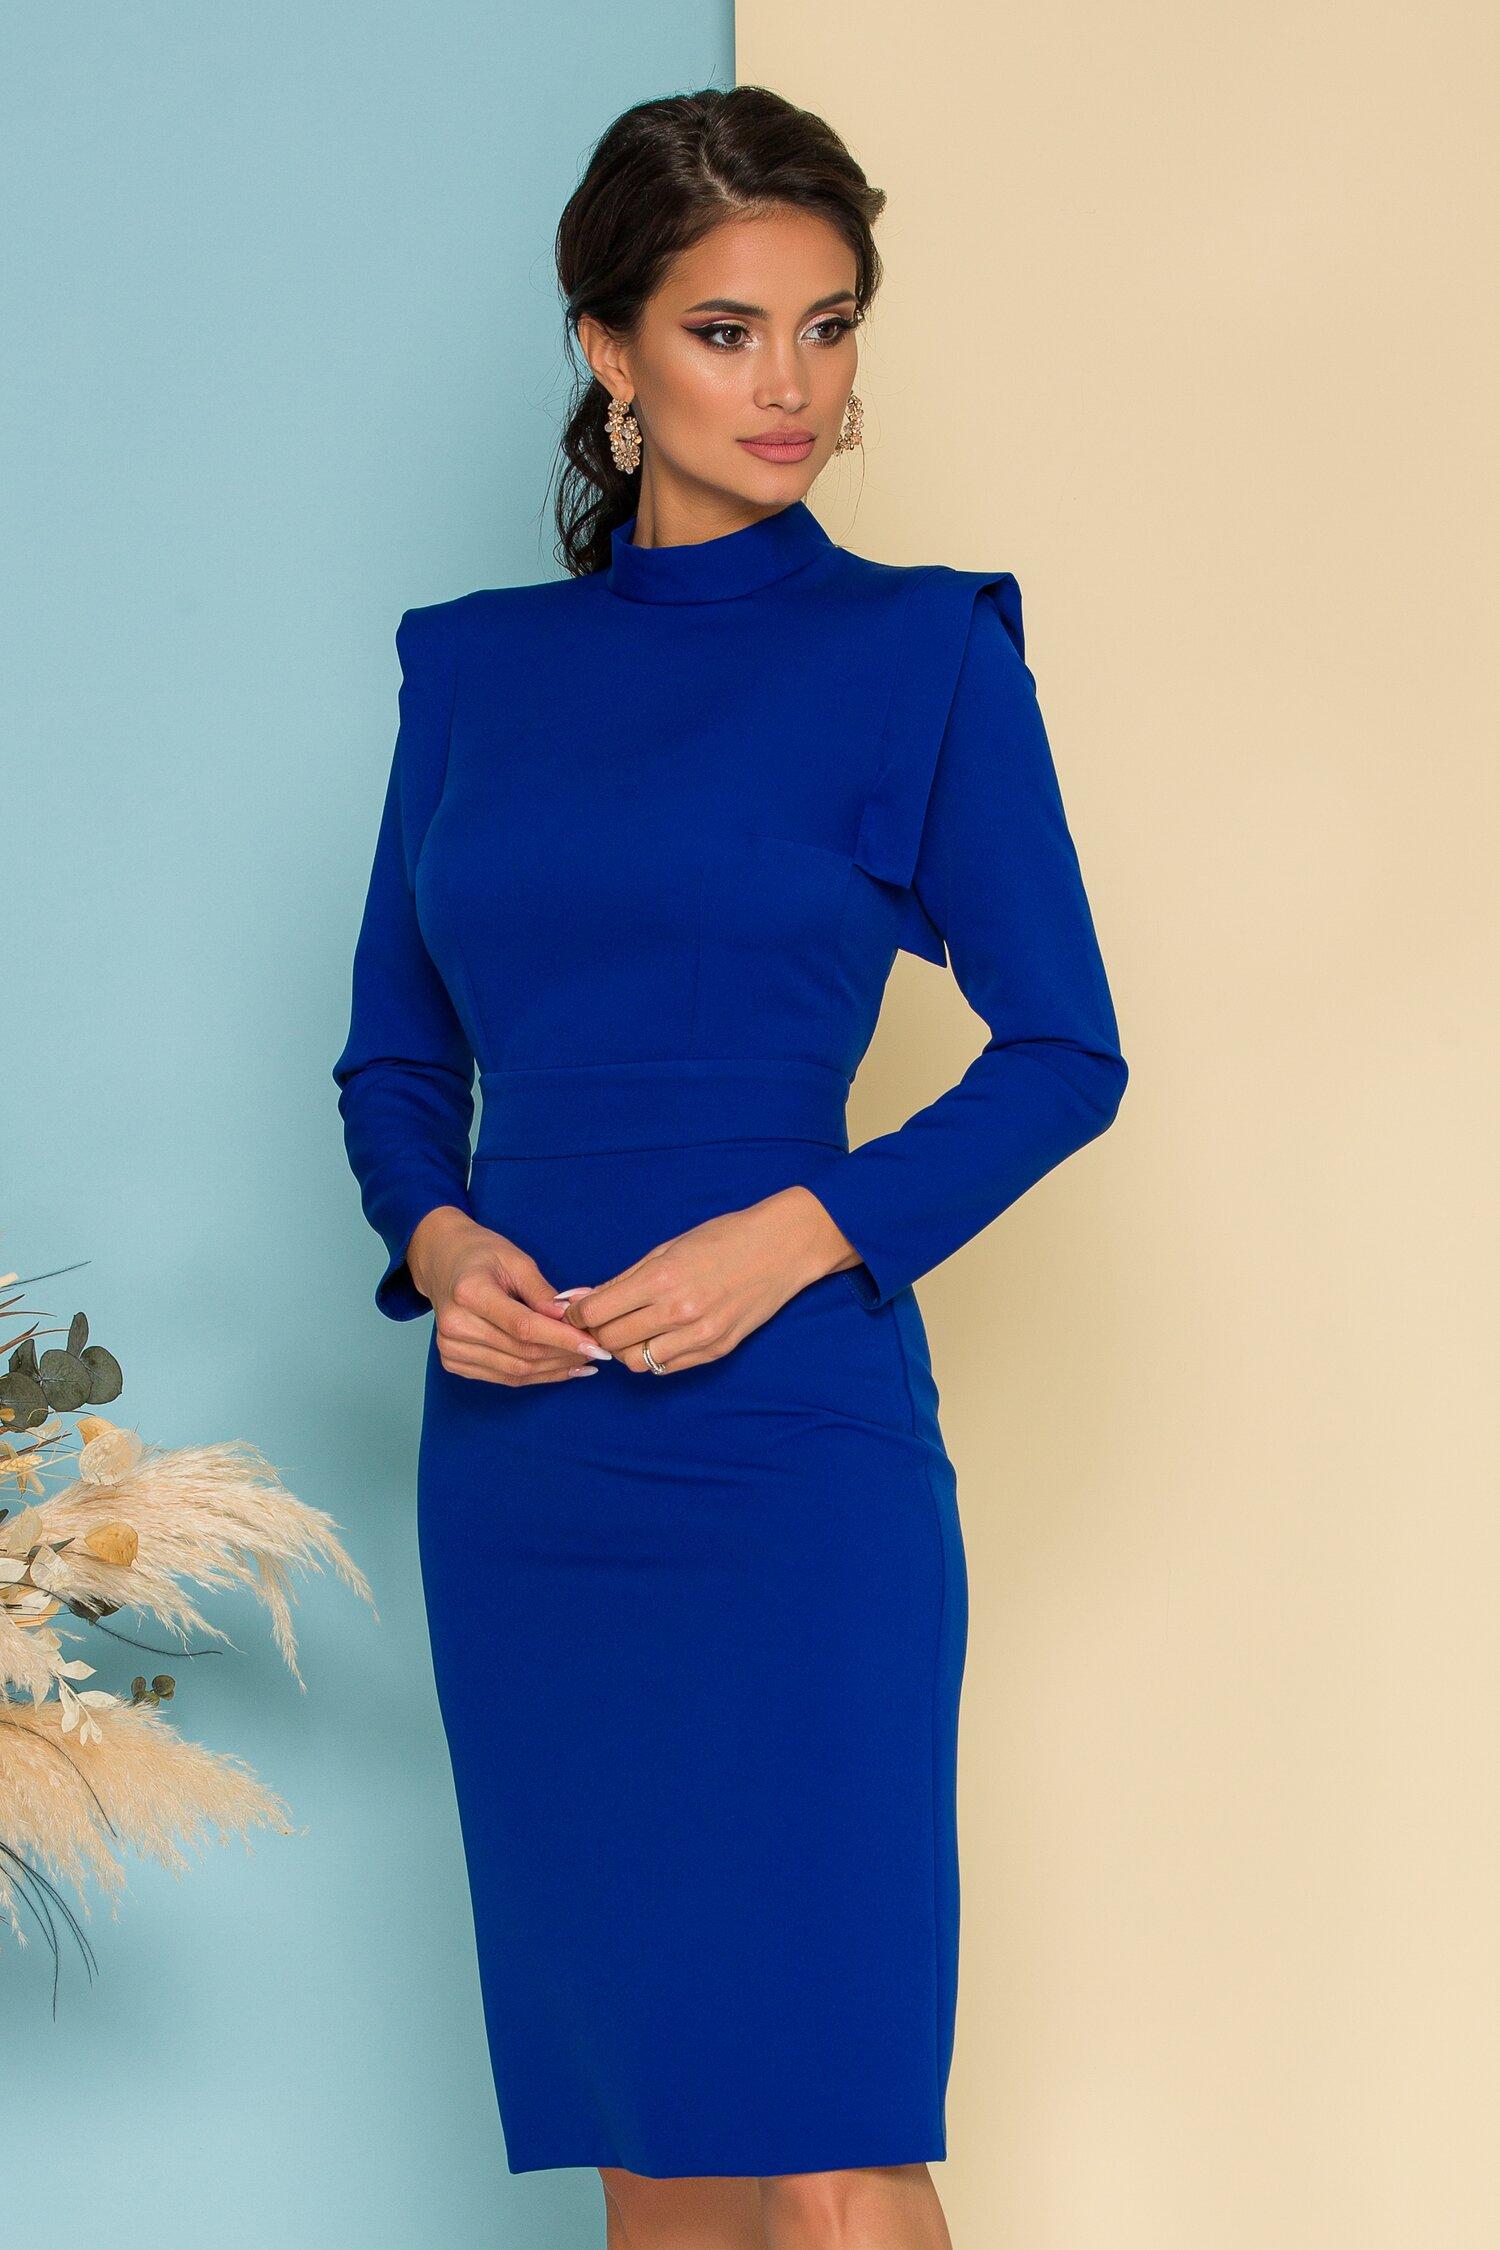 Rochie Moze office conica albastru royal